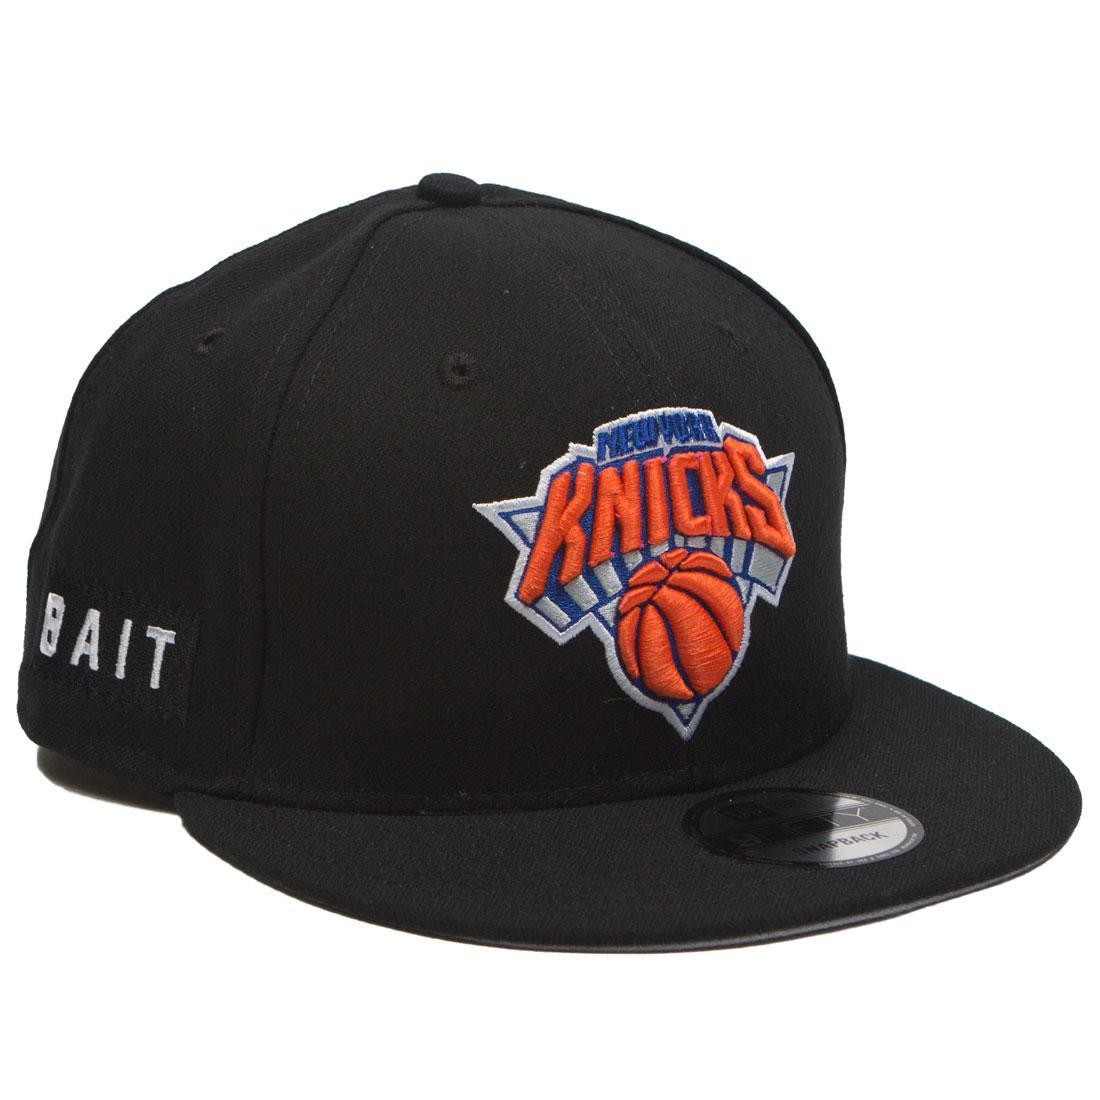 promo code 0753b 02f9e BAIT x NBA X New Era 9Fifty New York Knicks OTC Snapback Cap black